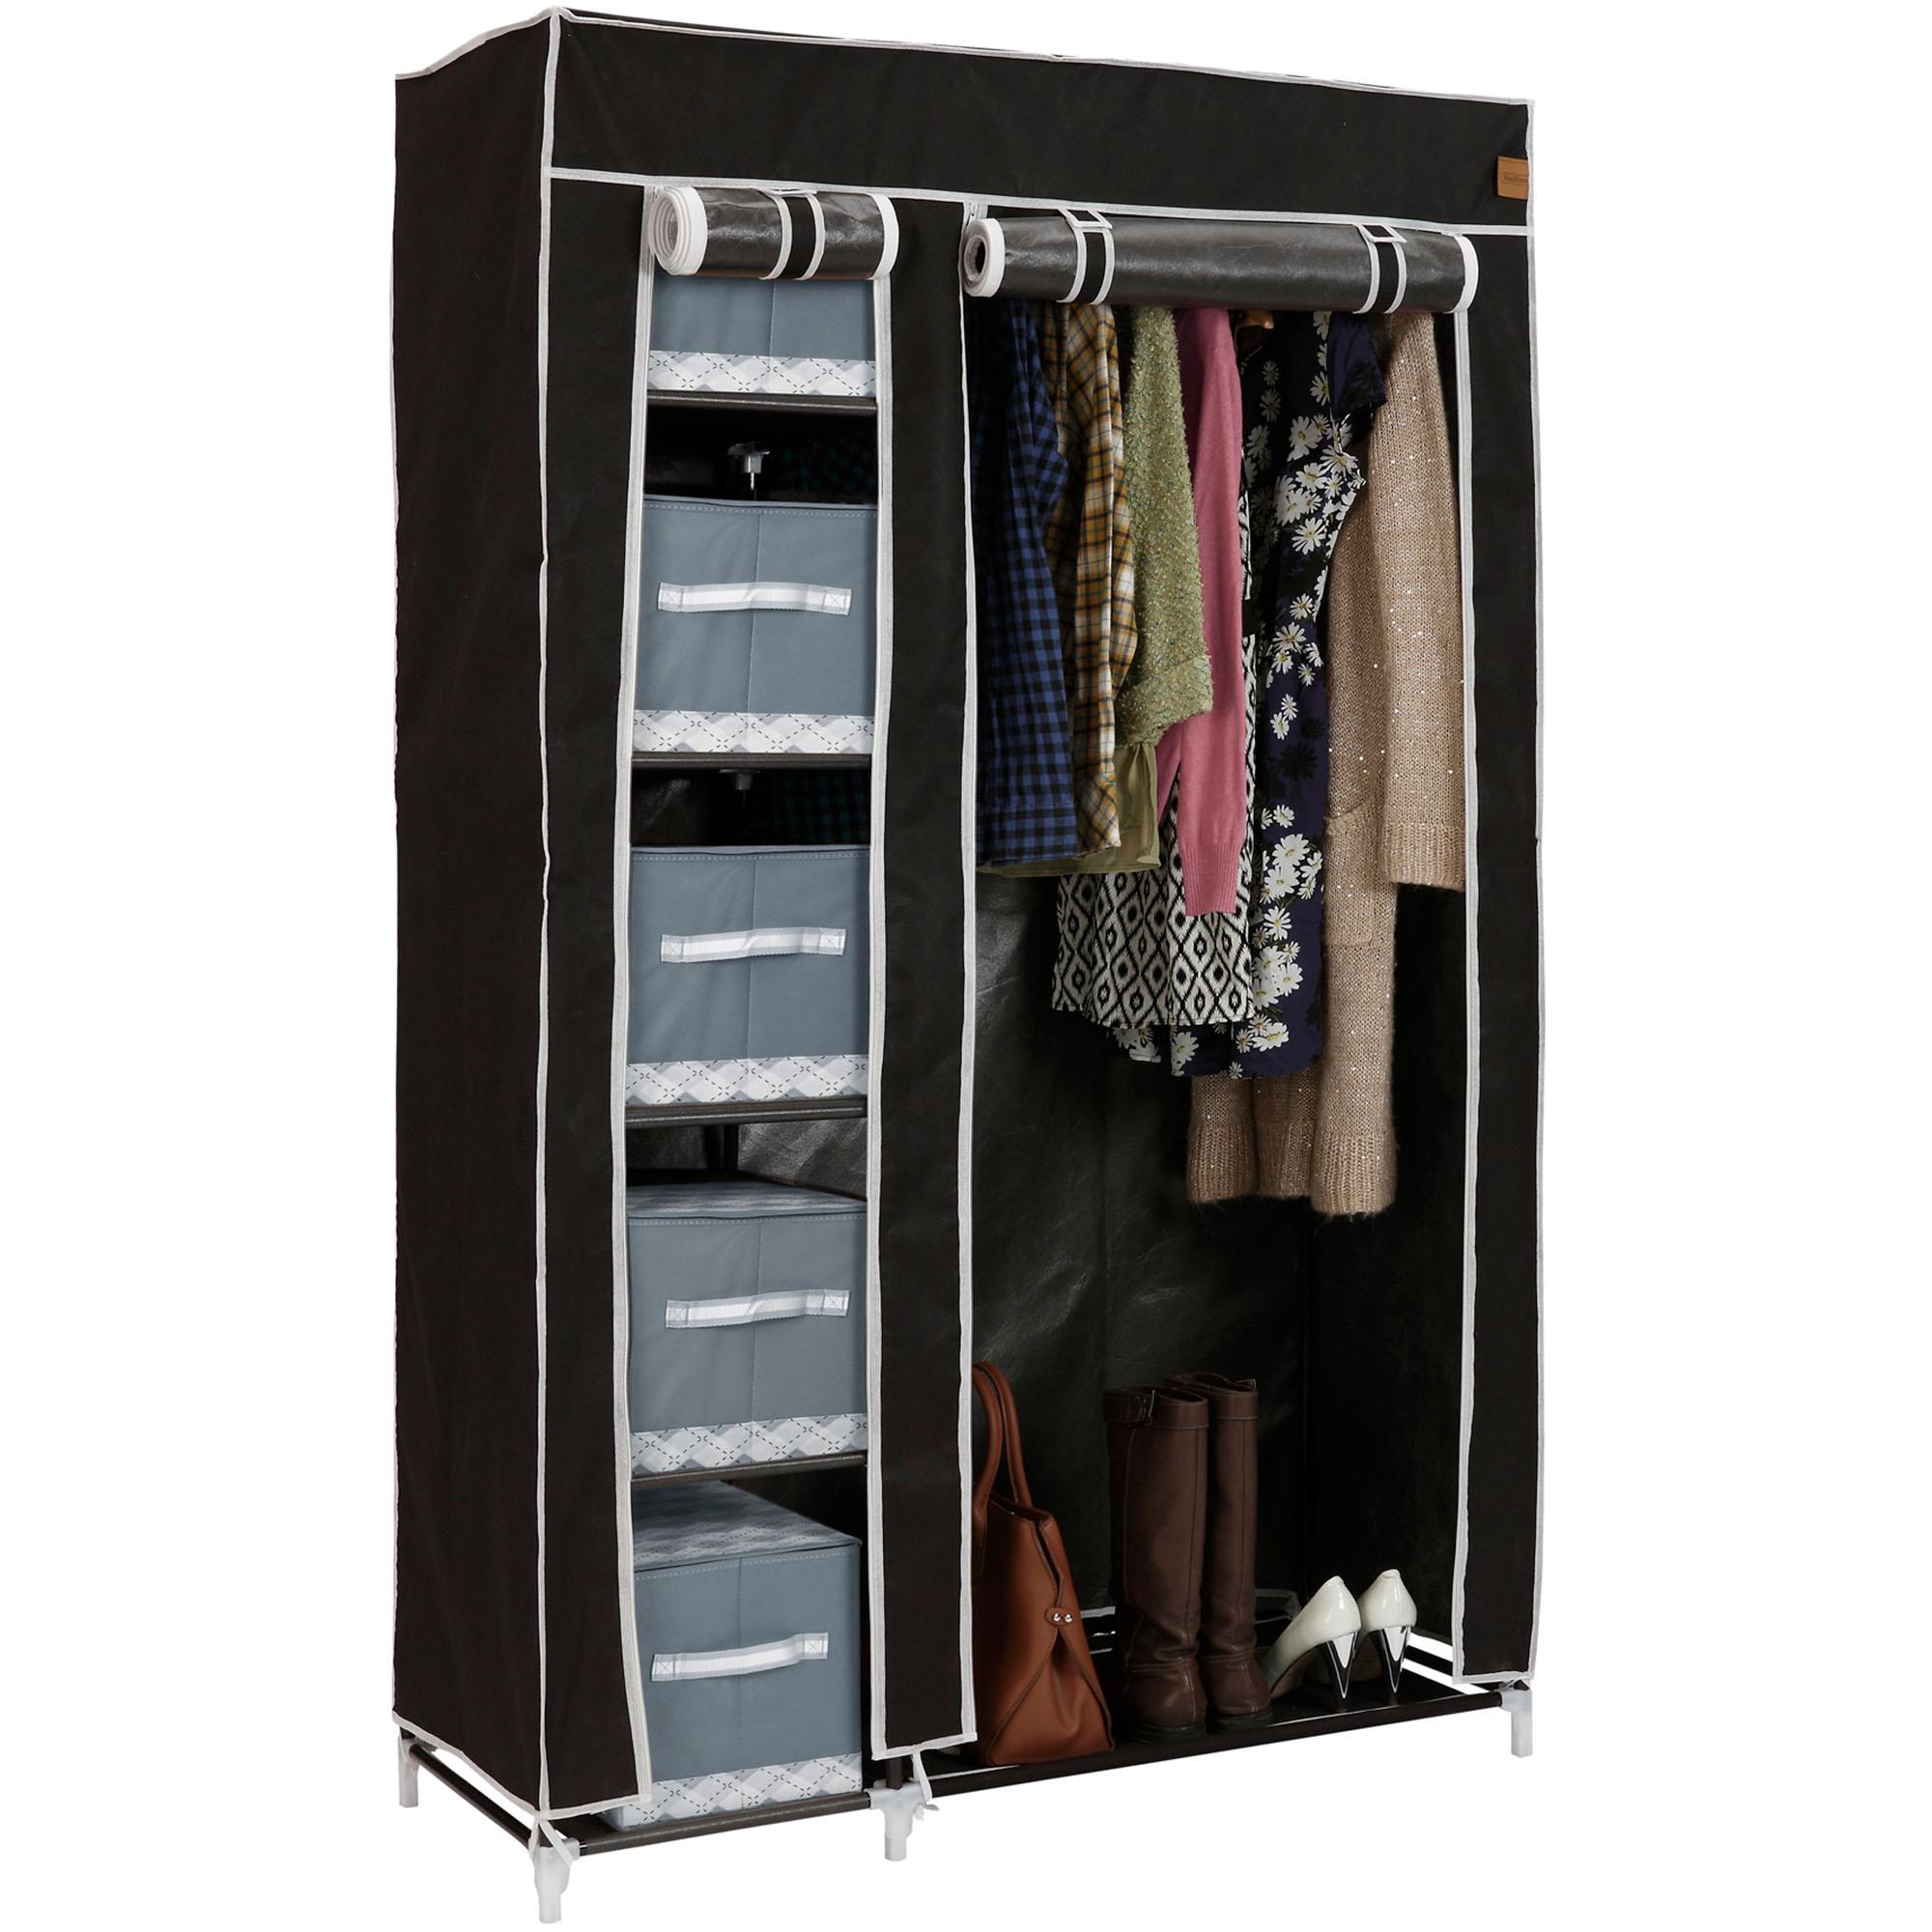 New Non Woven Fabric Folding Underwear Storage Box Bedroom: VonHaus Double Canvas Wardrobe Clothes Hanging Rail